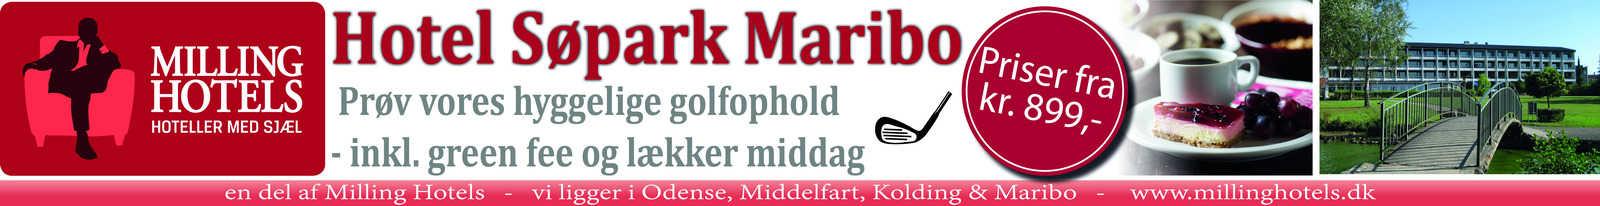 Hotel Søpark Maribo golfophold